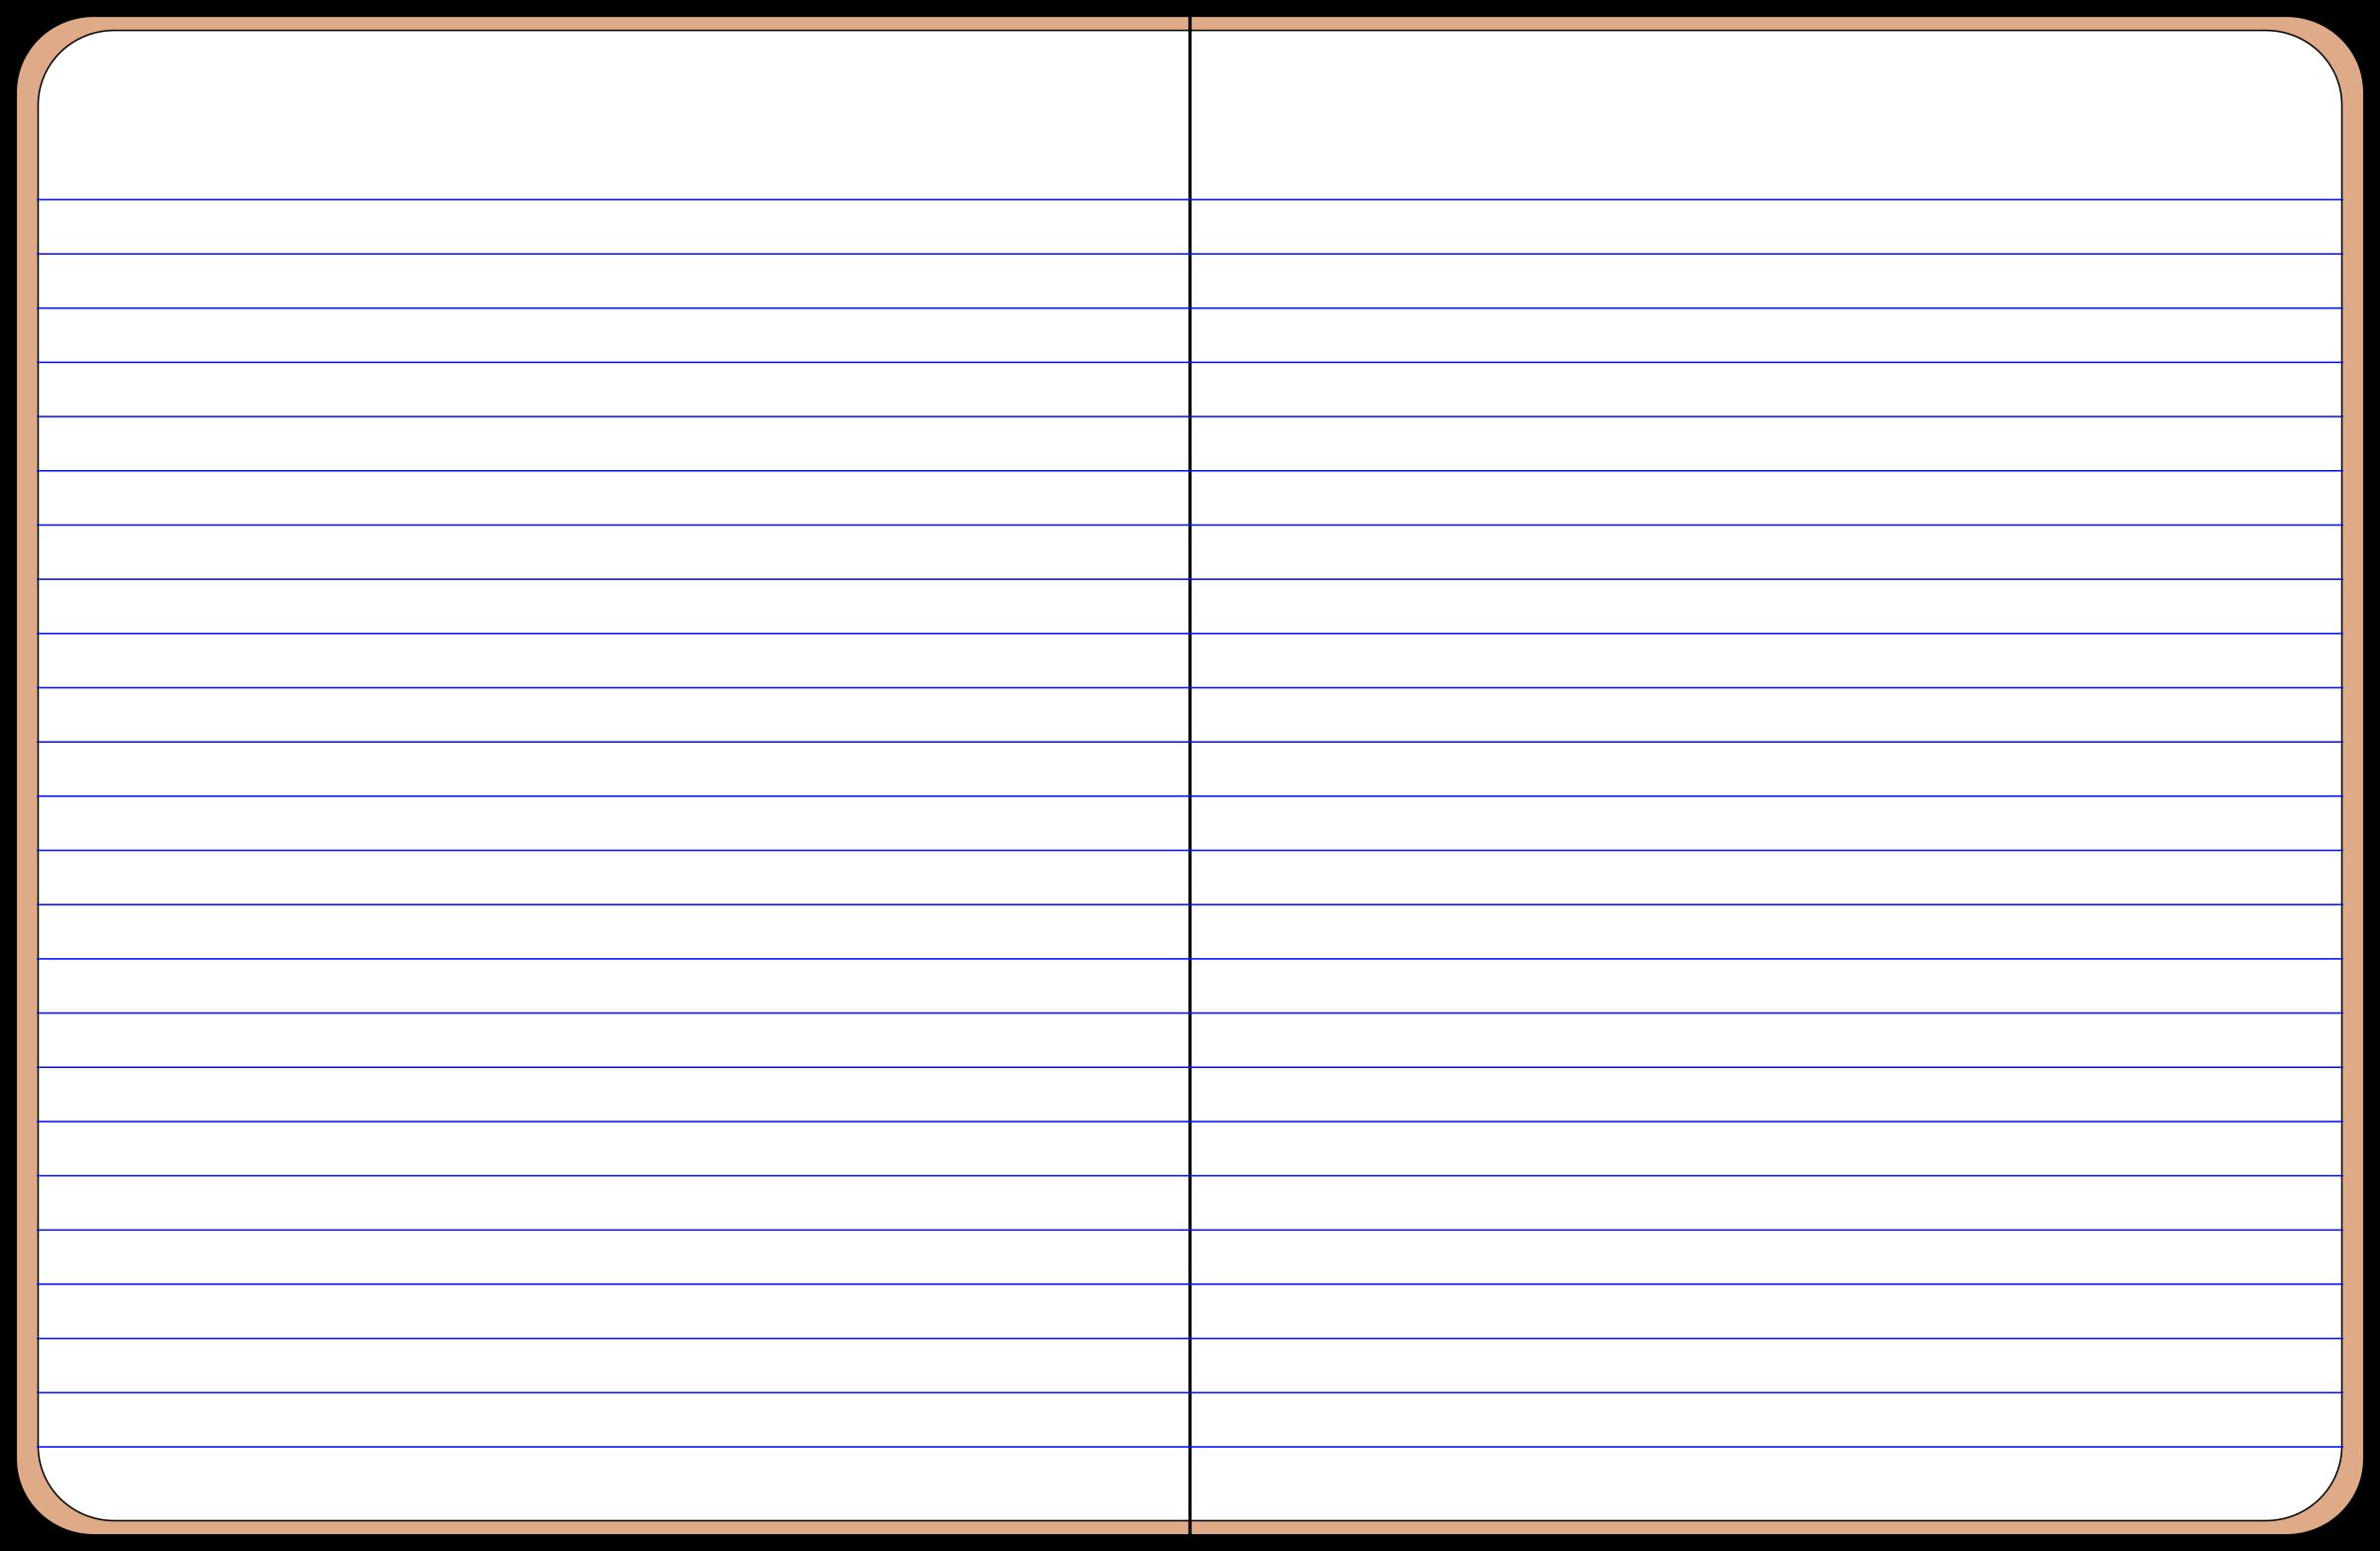 Paper clipart note book Notebook notebook Clipart Open Open